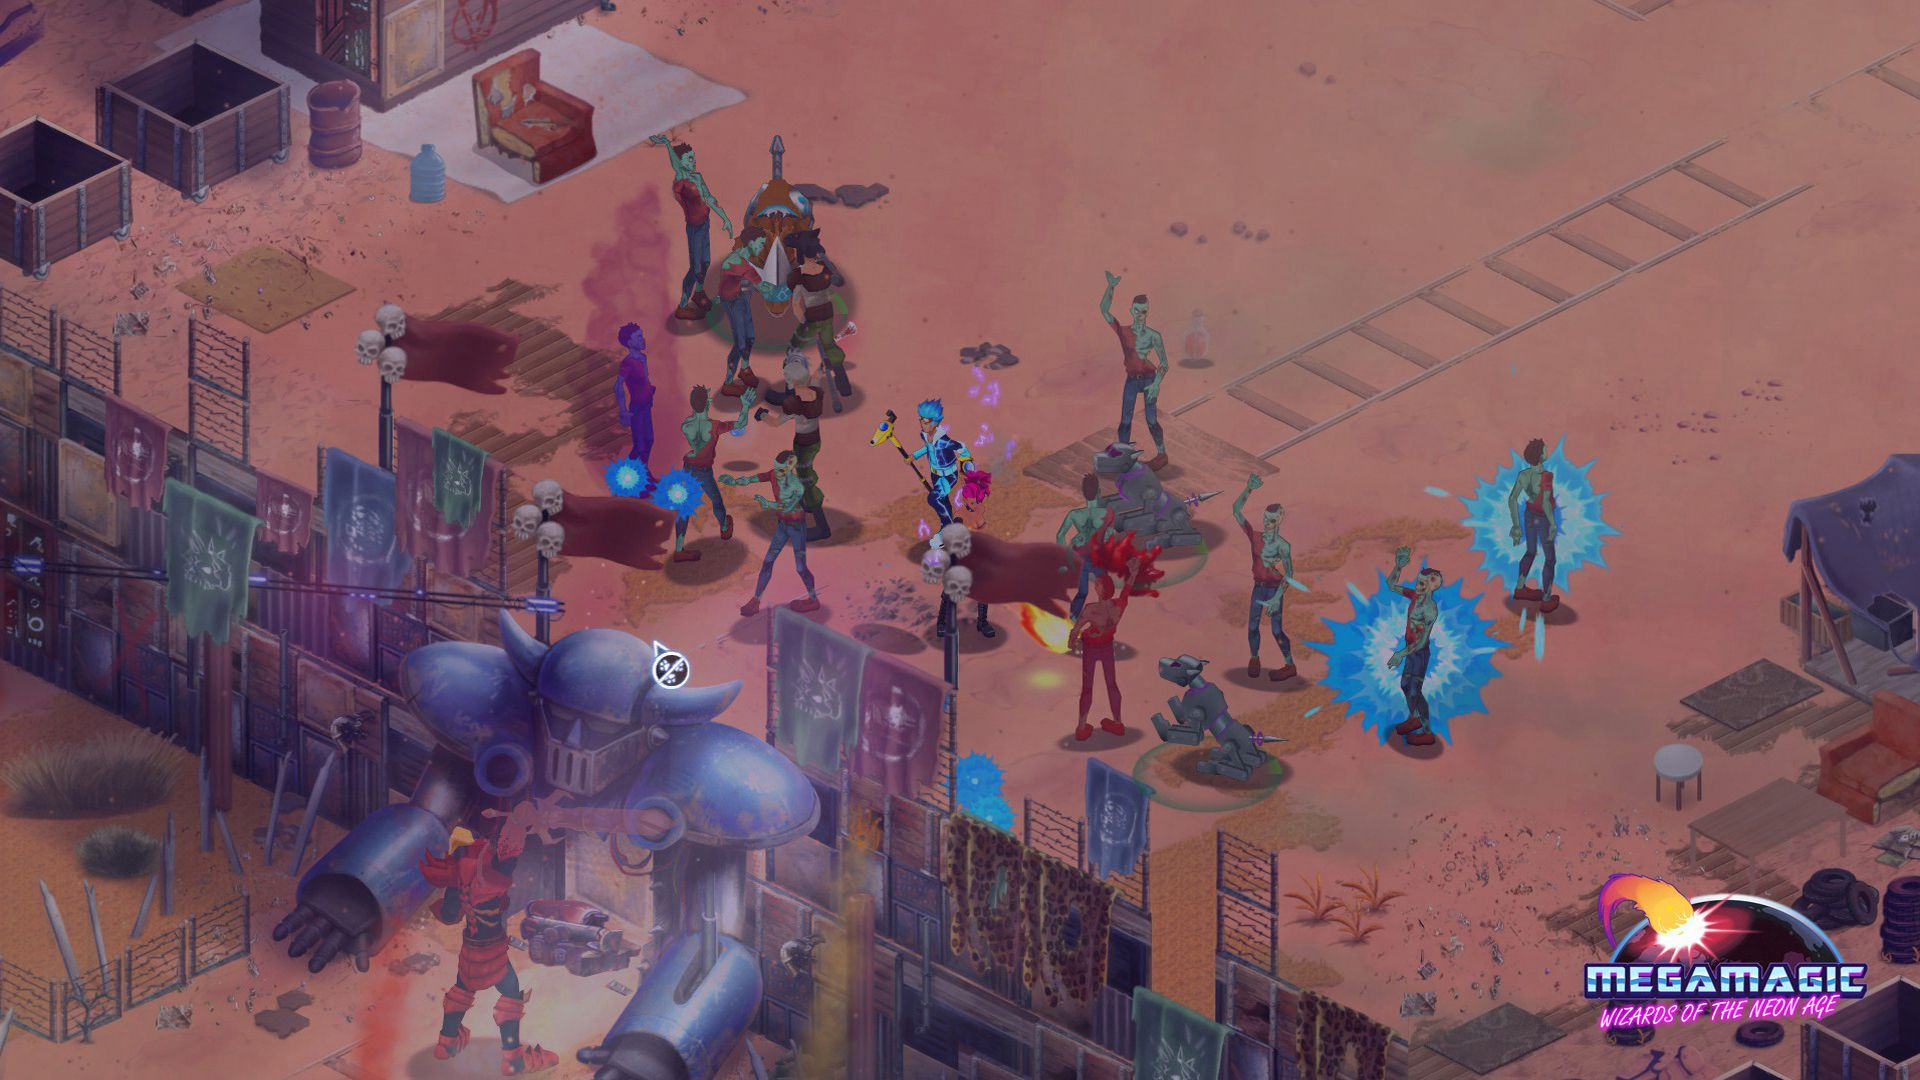 Megamagic: Wizards of the Neon Age Captura 1